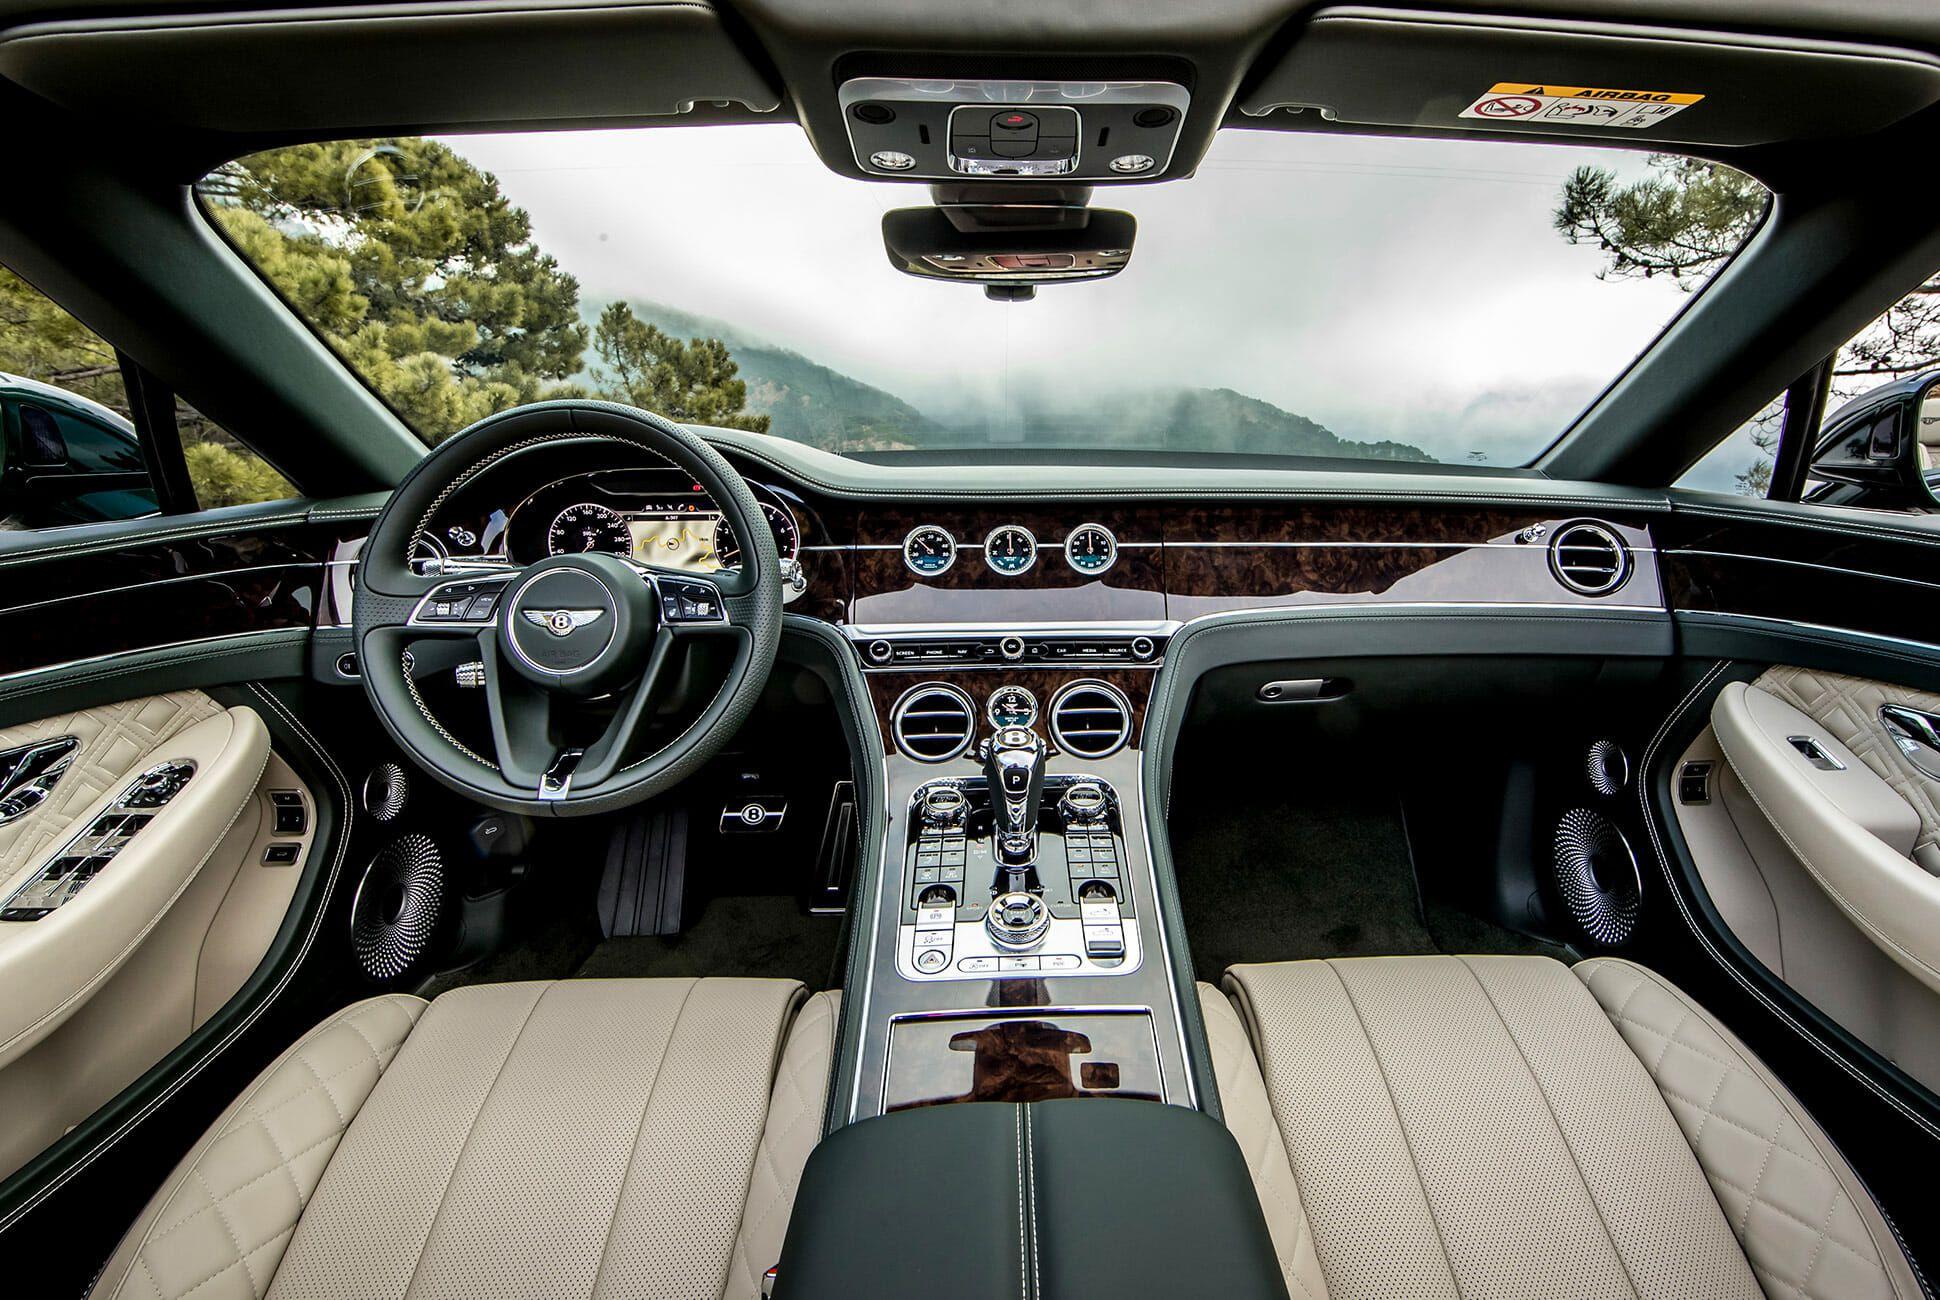 Bentley-Continental-GTC-Review-gear-patrol-slide-8